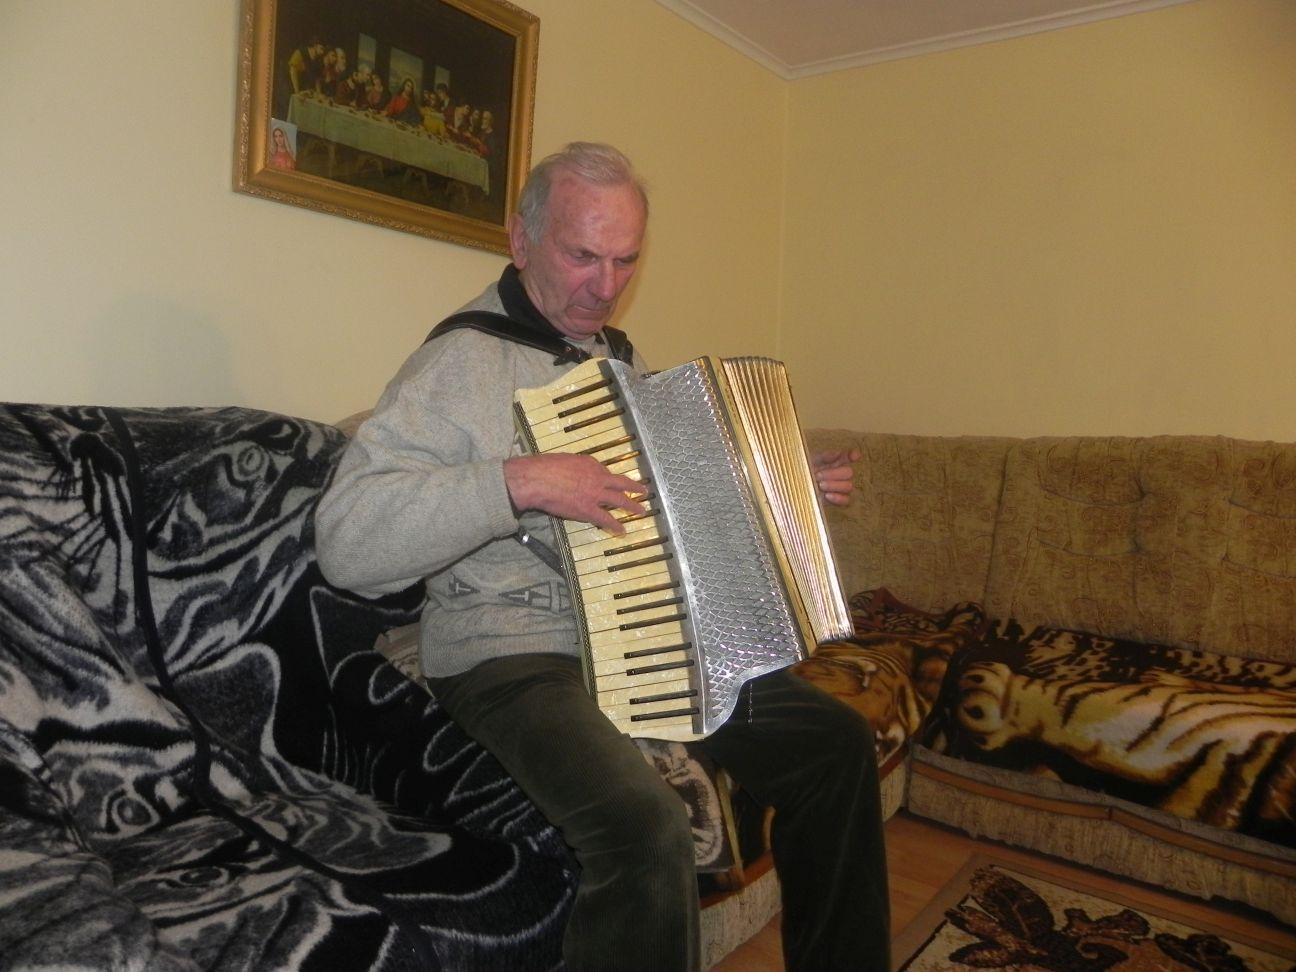 2017-02-10 Parolice - Kazimierz Wieteska (2)